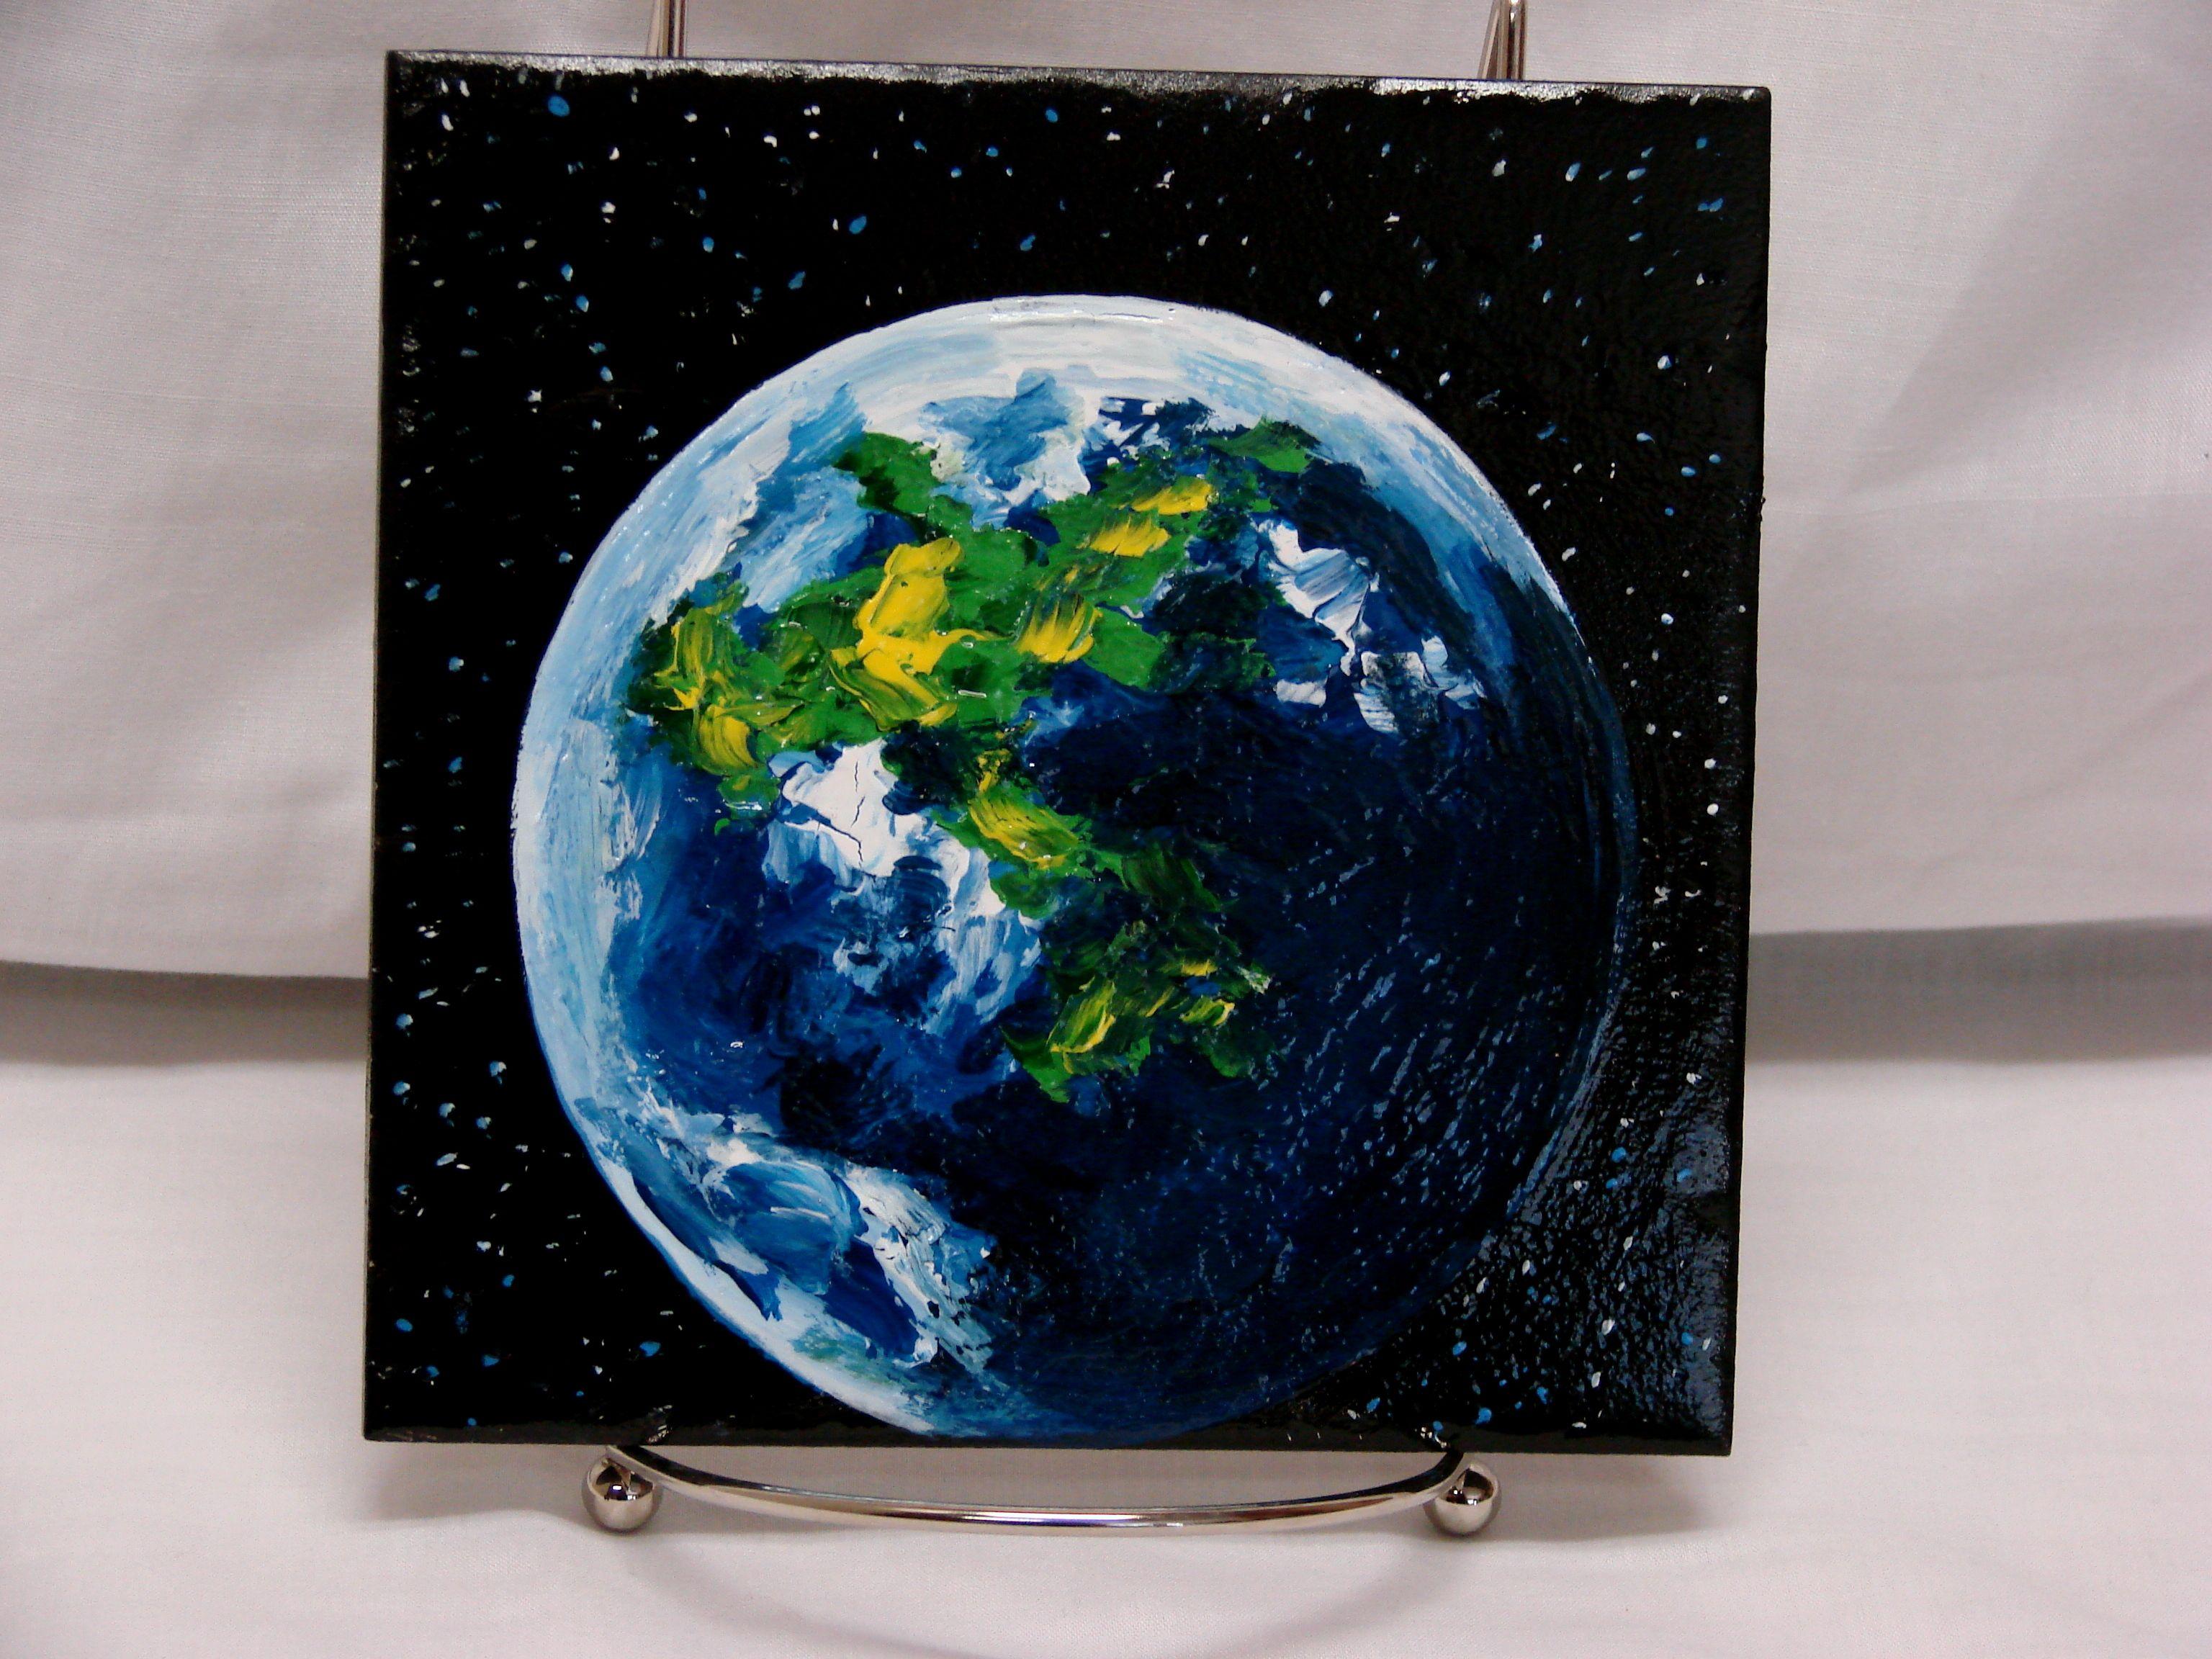 Wonderful 1 Inch Ceramic Tiles Big 12X12 Black Ceramic Tile Clean 12X12 Ceiling Tile 12X12 Ceramic Floor Tile Youthful 12X24 Ceramic Tile Patterns Blue2X4 Glass Subway Tile Planet Earth Original, Acrylic Painting On 6\